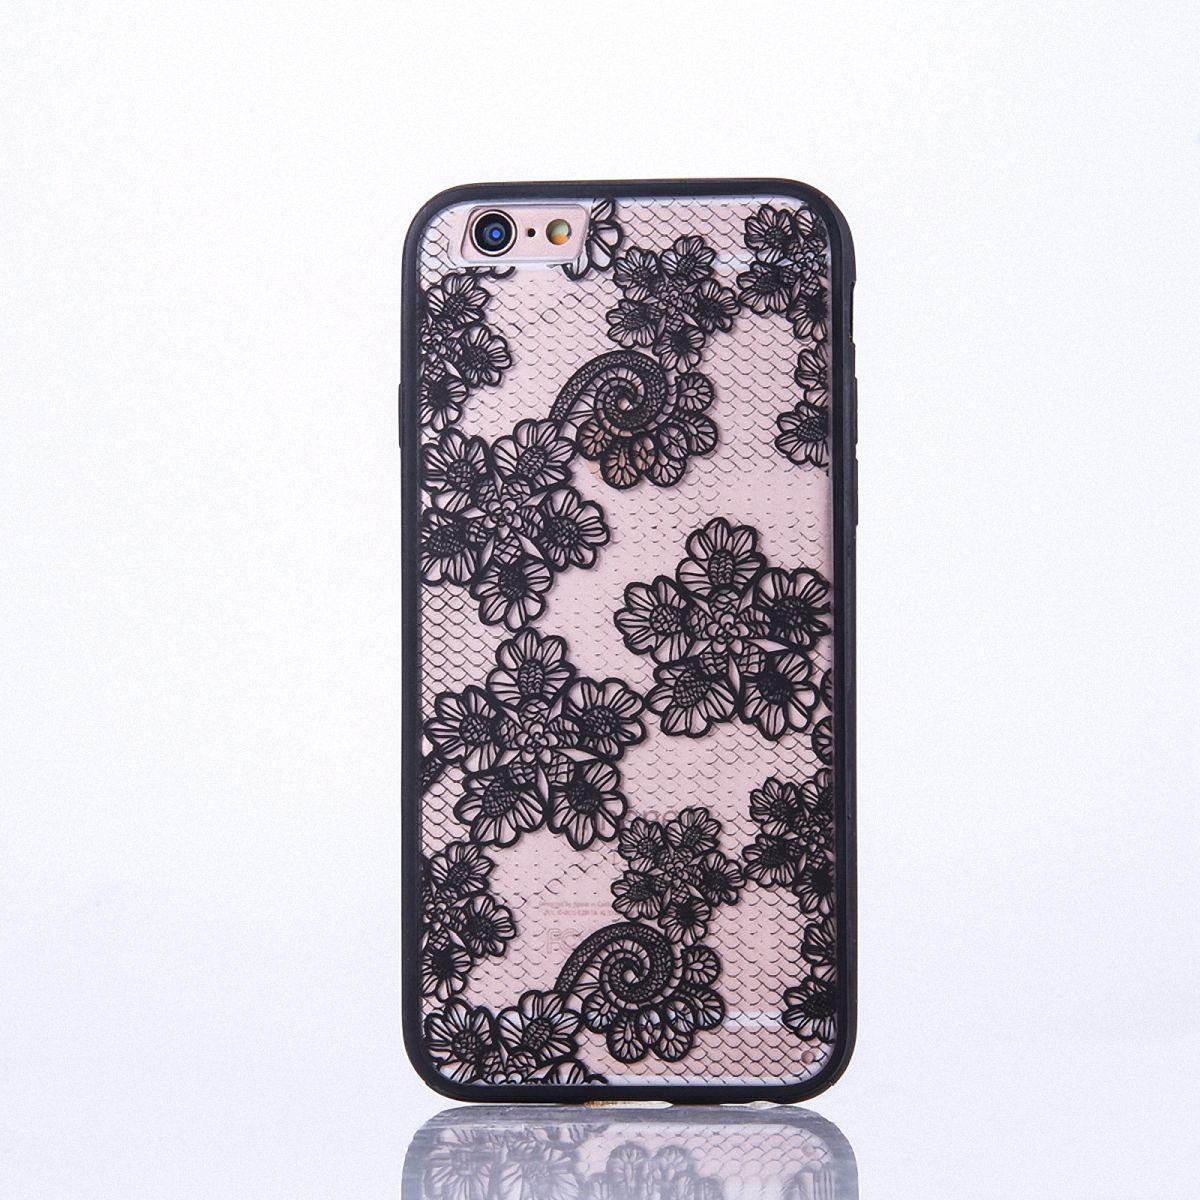 Handy Hülle Mandala für Apple iPhone 8 Design Case Schutzhülle Motiv Blüten Cover Tasche Bumper Schwarz